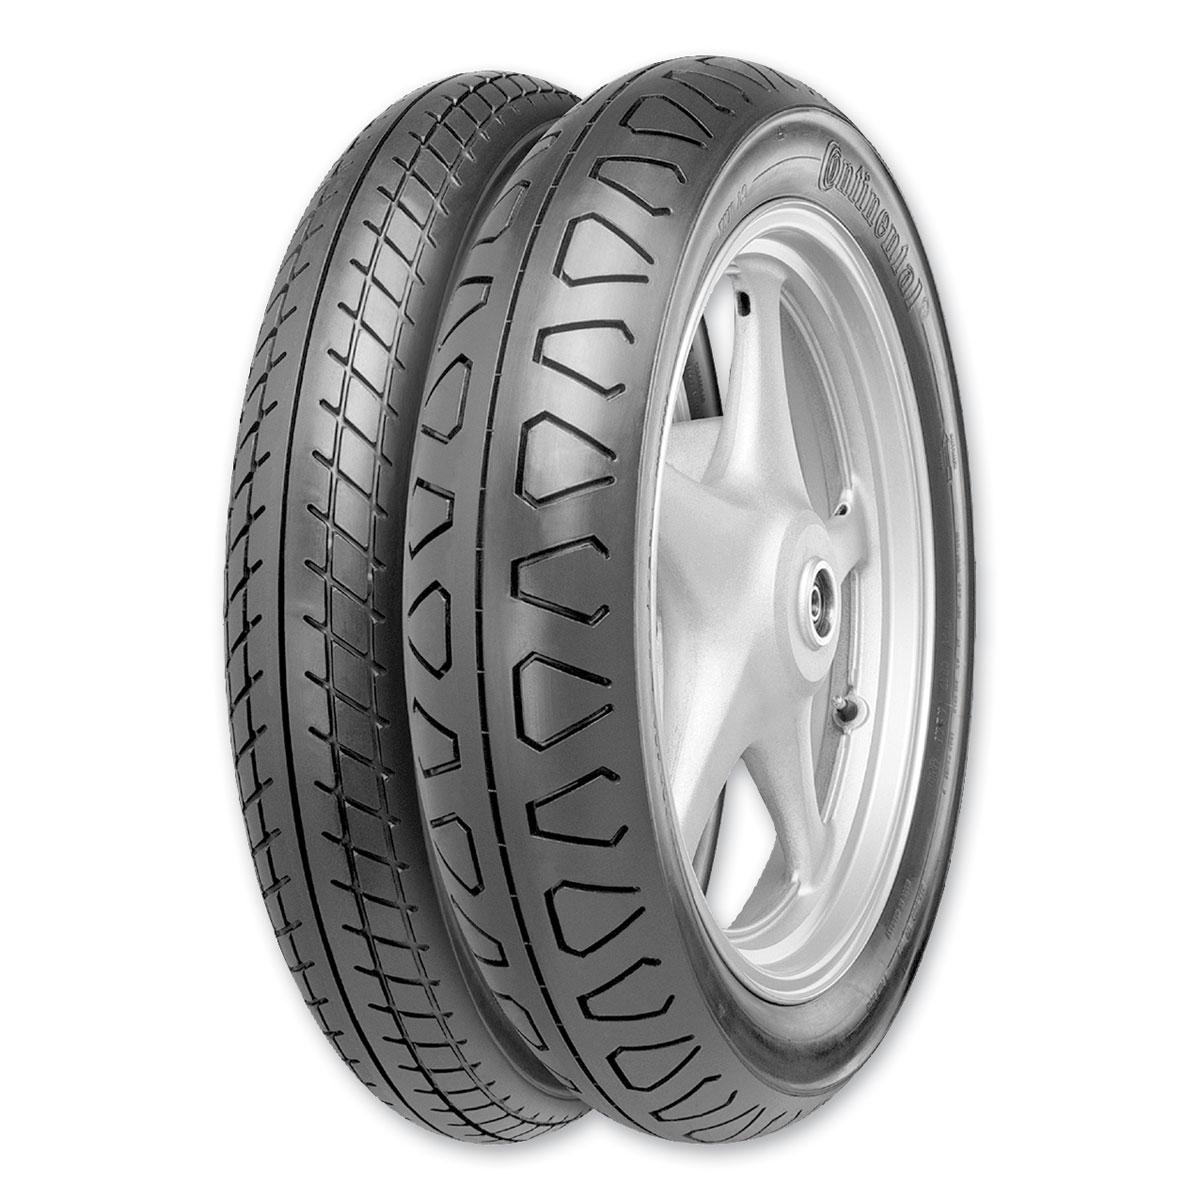 Continental TKV11 100/90V18 Front Tire